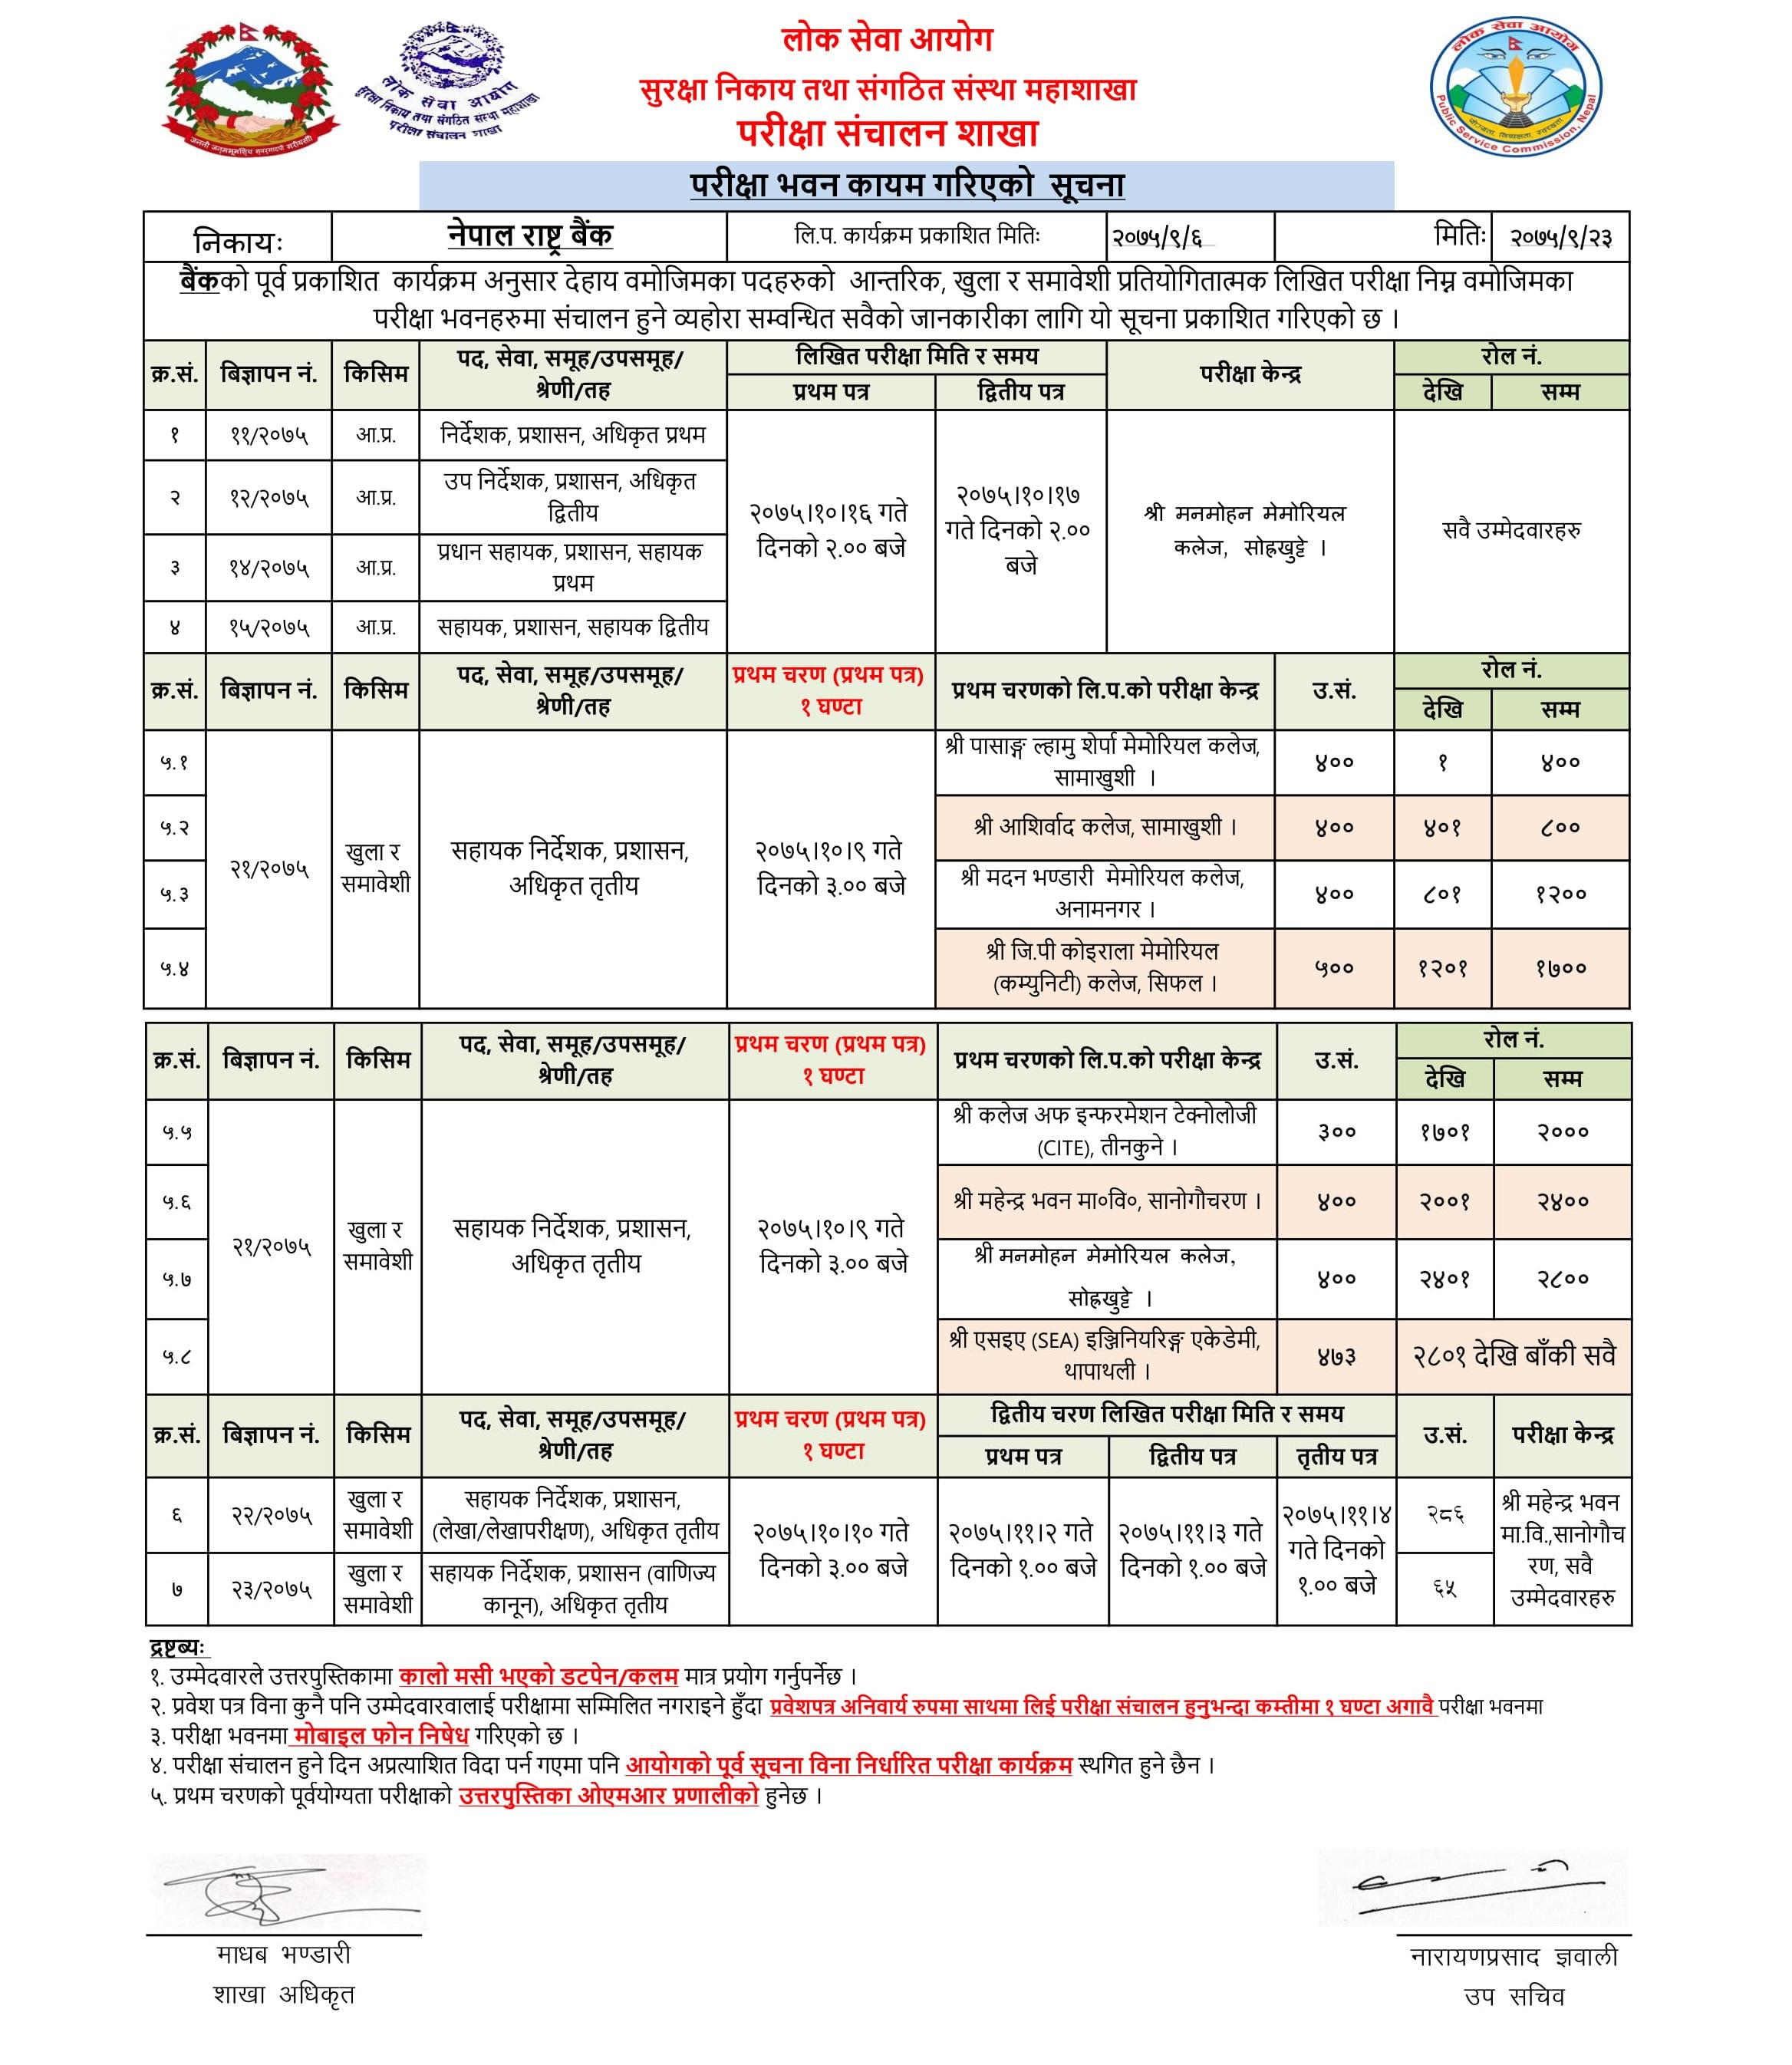 nepal rastra bank exam form